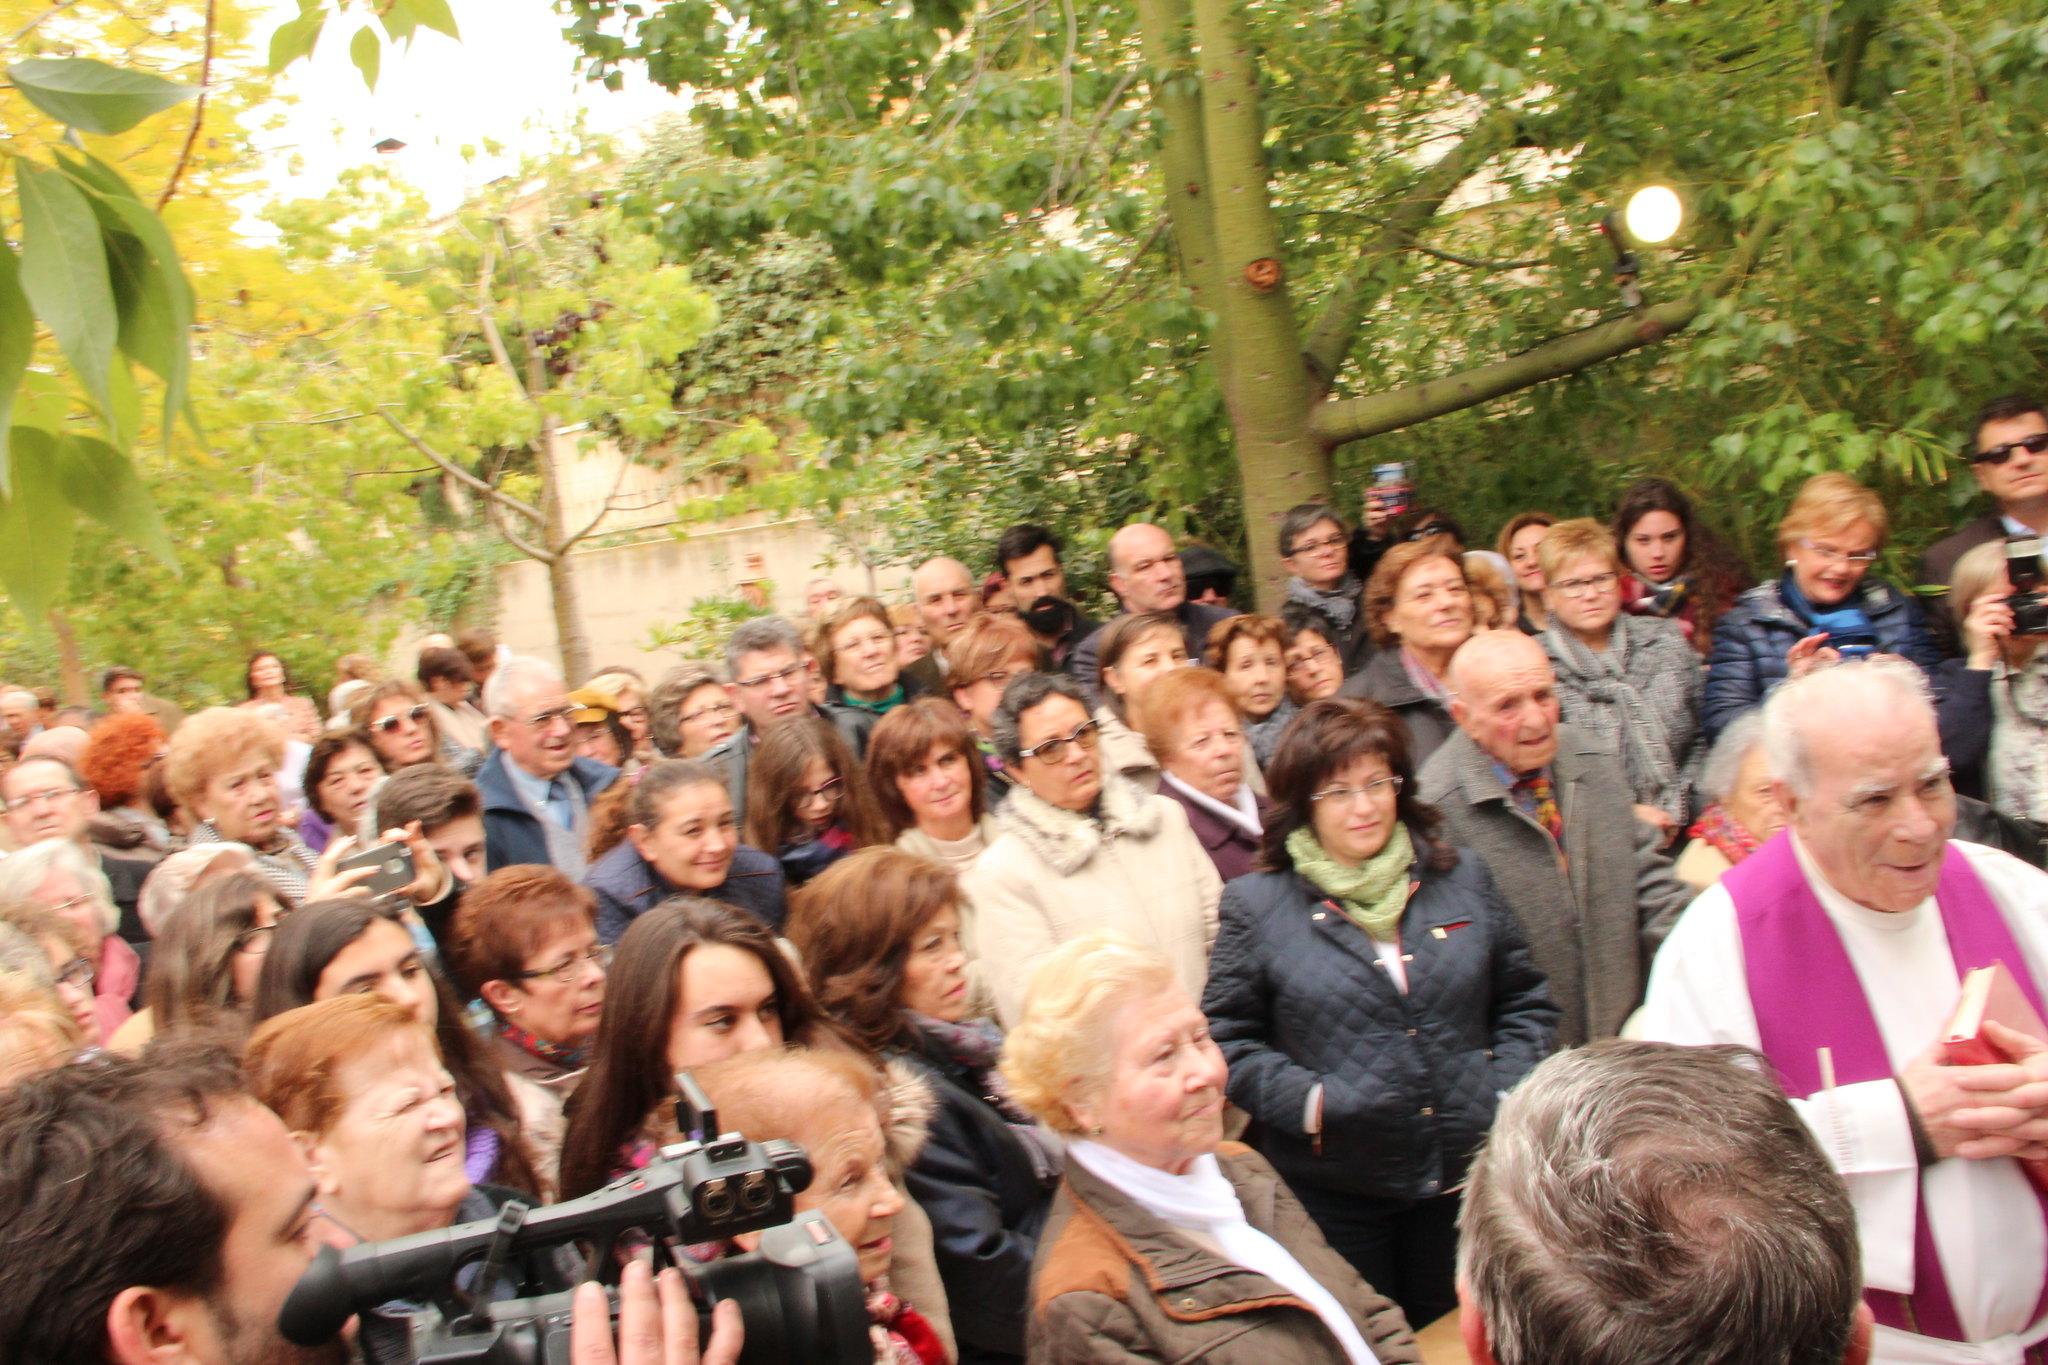 (2016-02-13) - Inauguración Virgen De Lourdes, La Molineta - Archivo La Molineta (082)